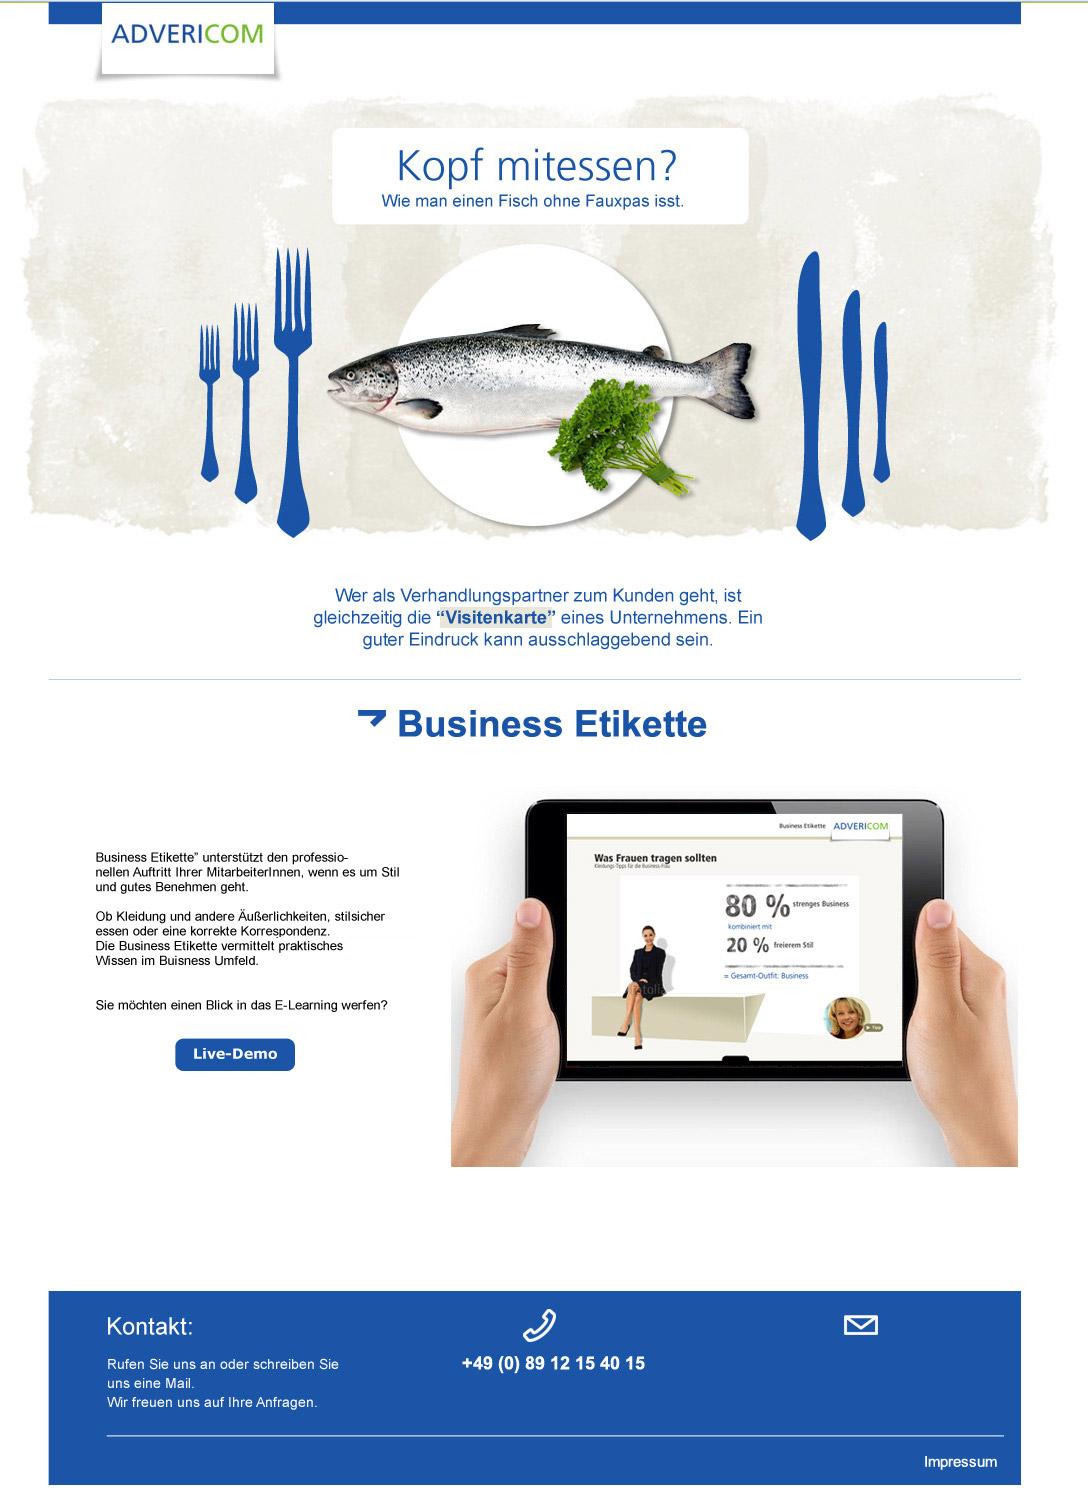 Landingpage Business Etikette